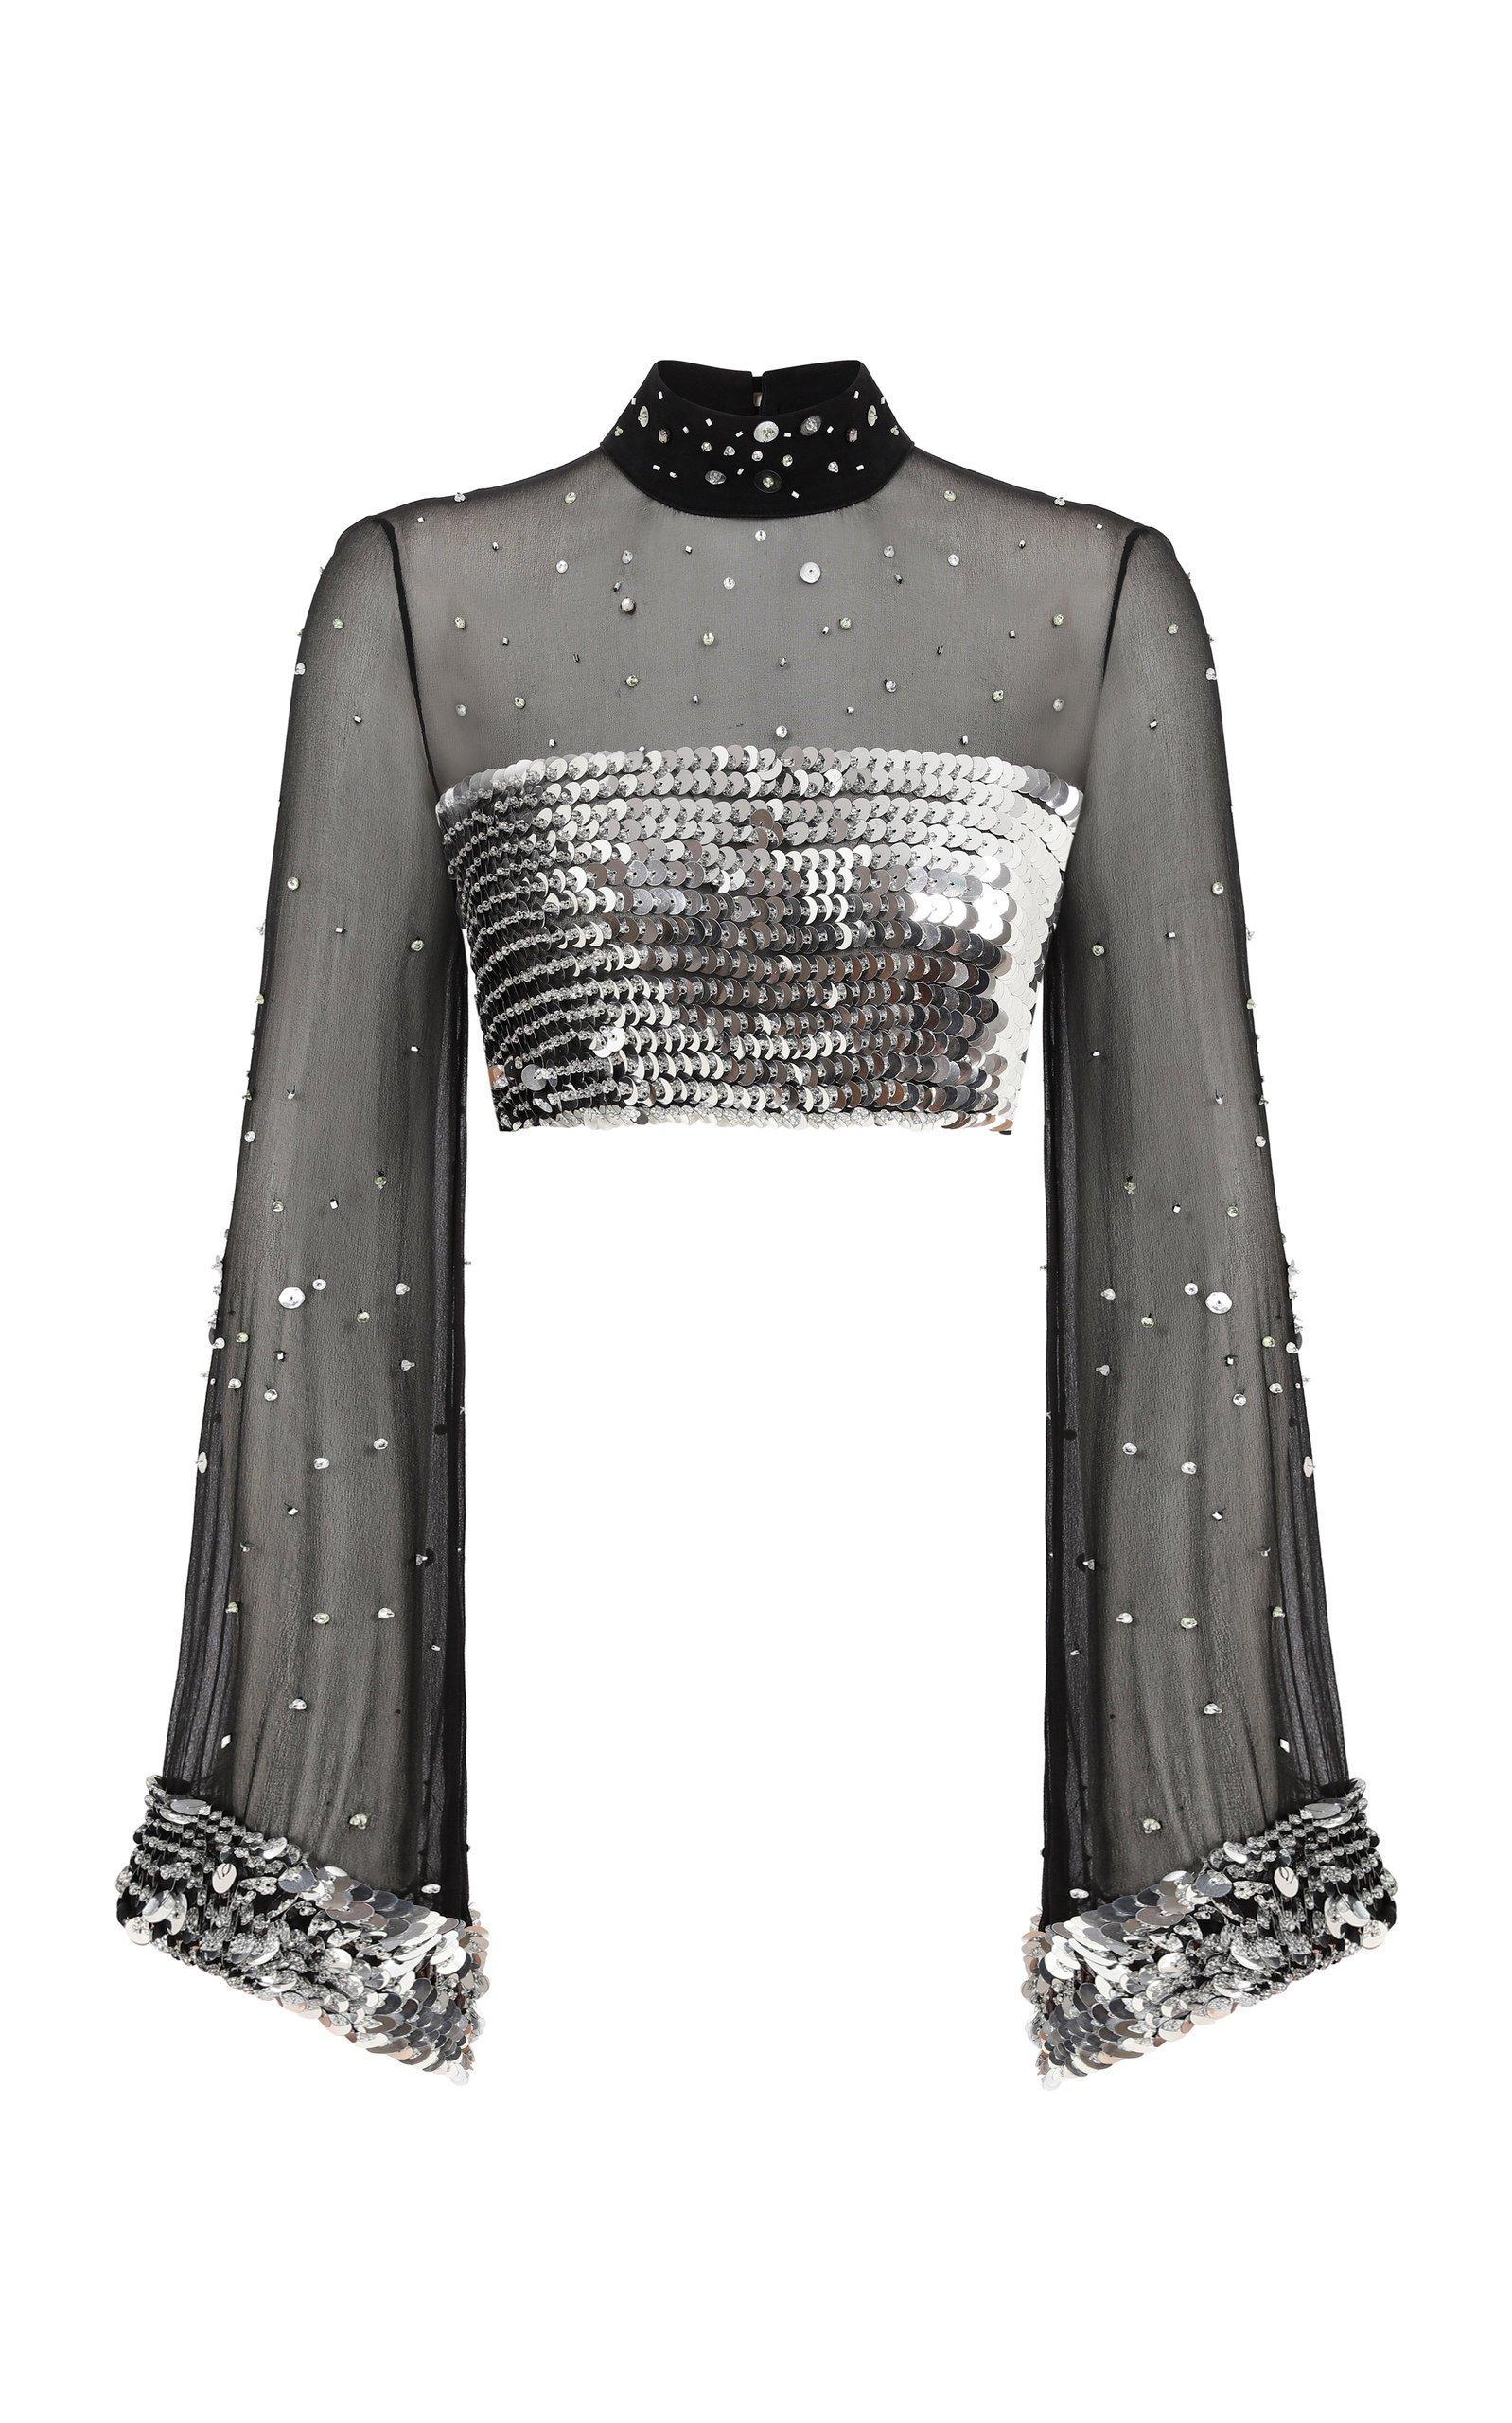 Raisa Vanessa Strass Embellished Black Crop Top